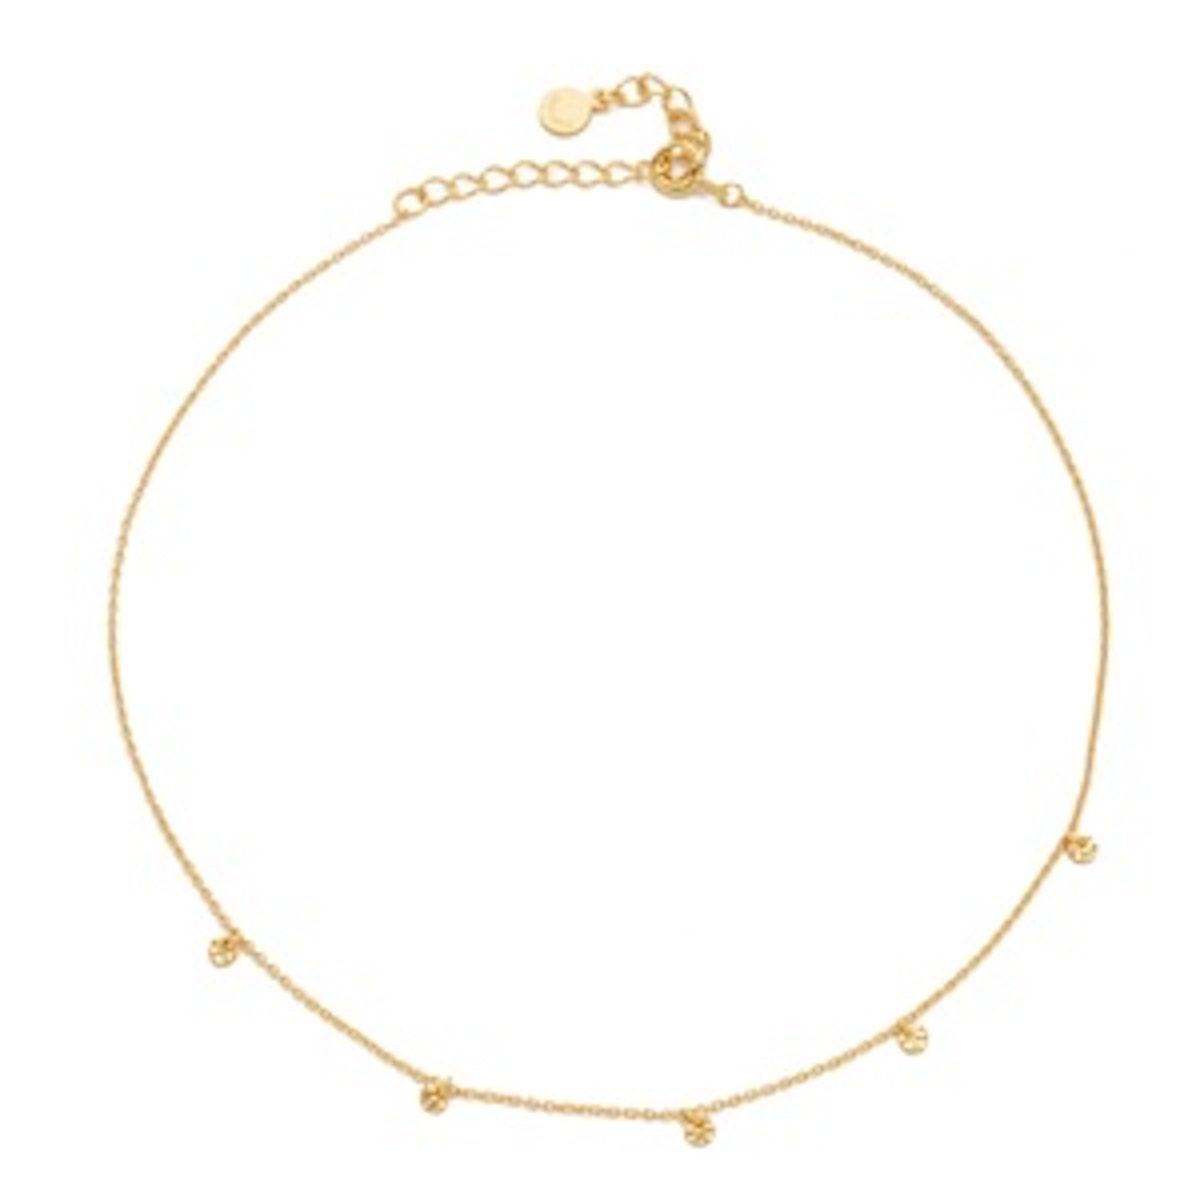 5 Disc Choker Necklace